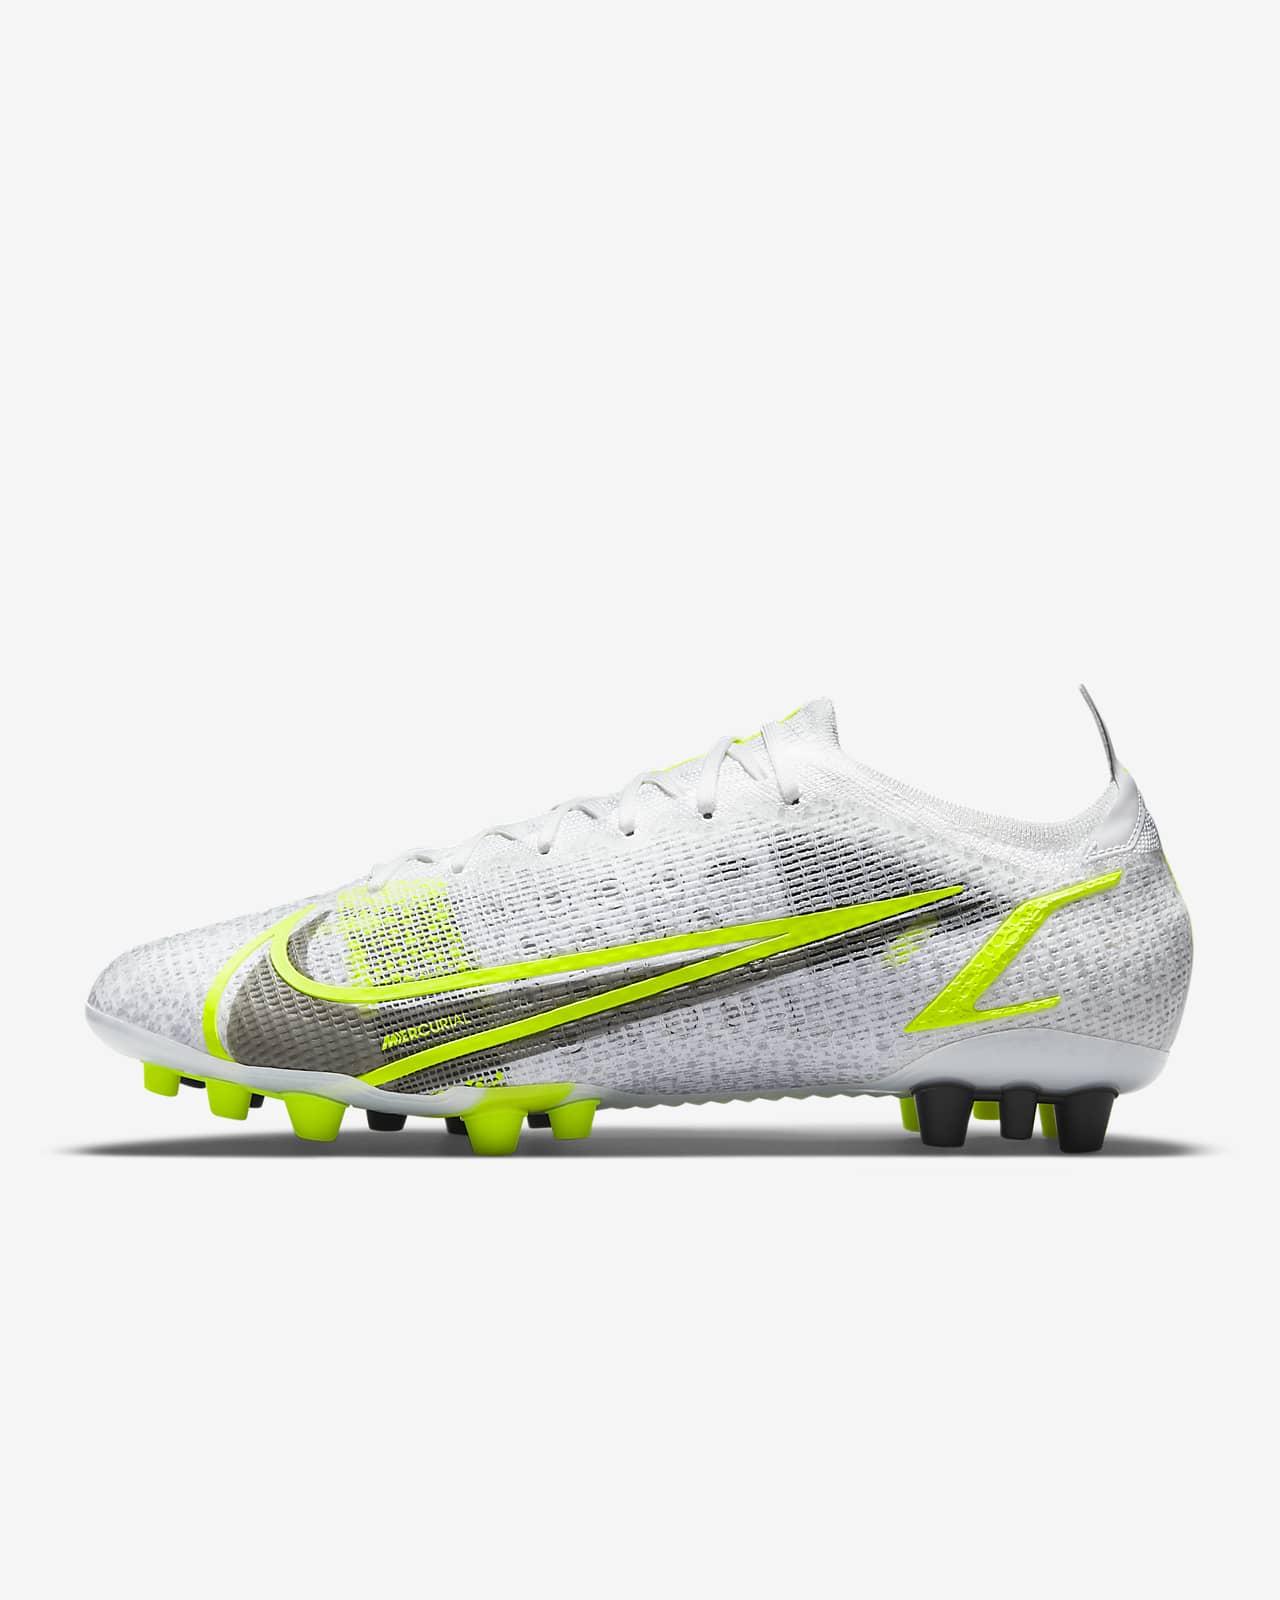 Nike Mercurial Vapor 14 Elite AG Artificial-Grass Football Boot